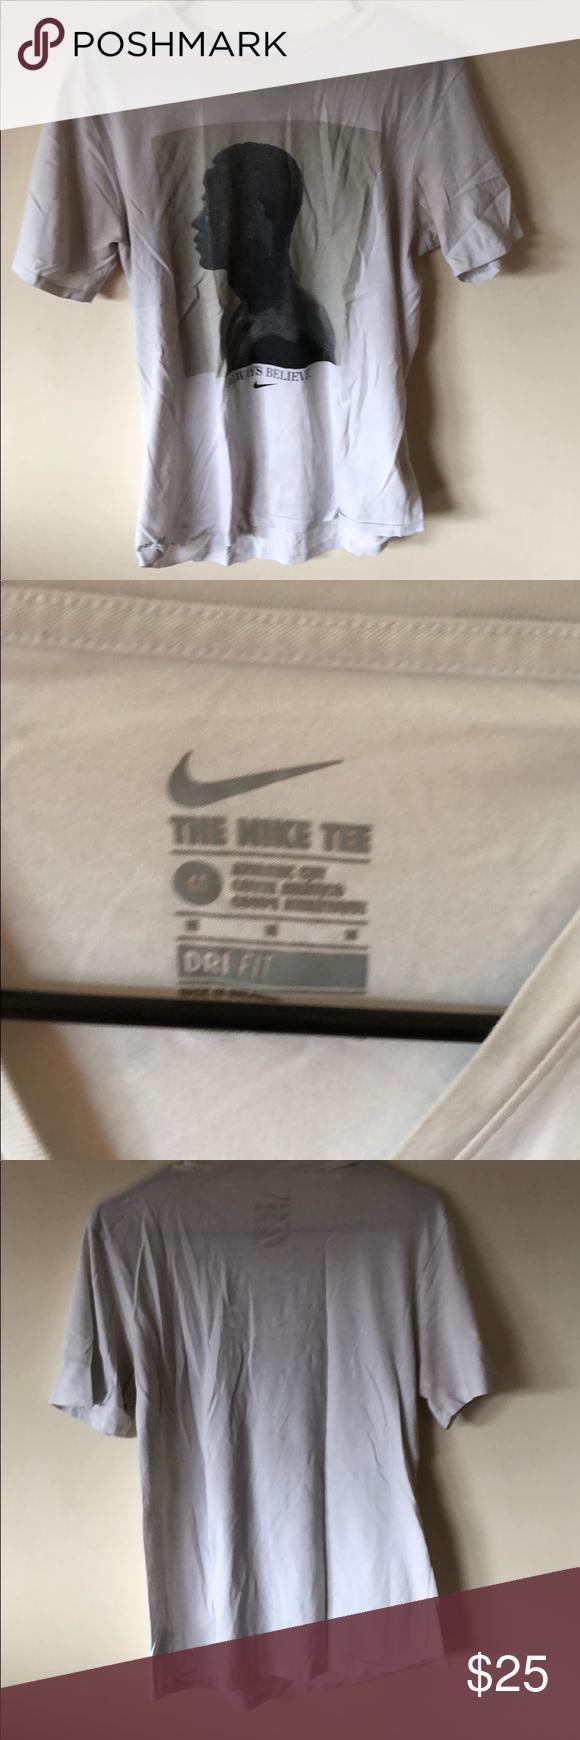 79373dbd1 Nike men's lebron james always believe t shirt Little worn dri fit Nike  Shirts Tees - Short Sleeve